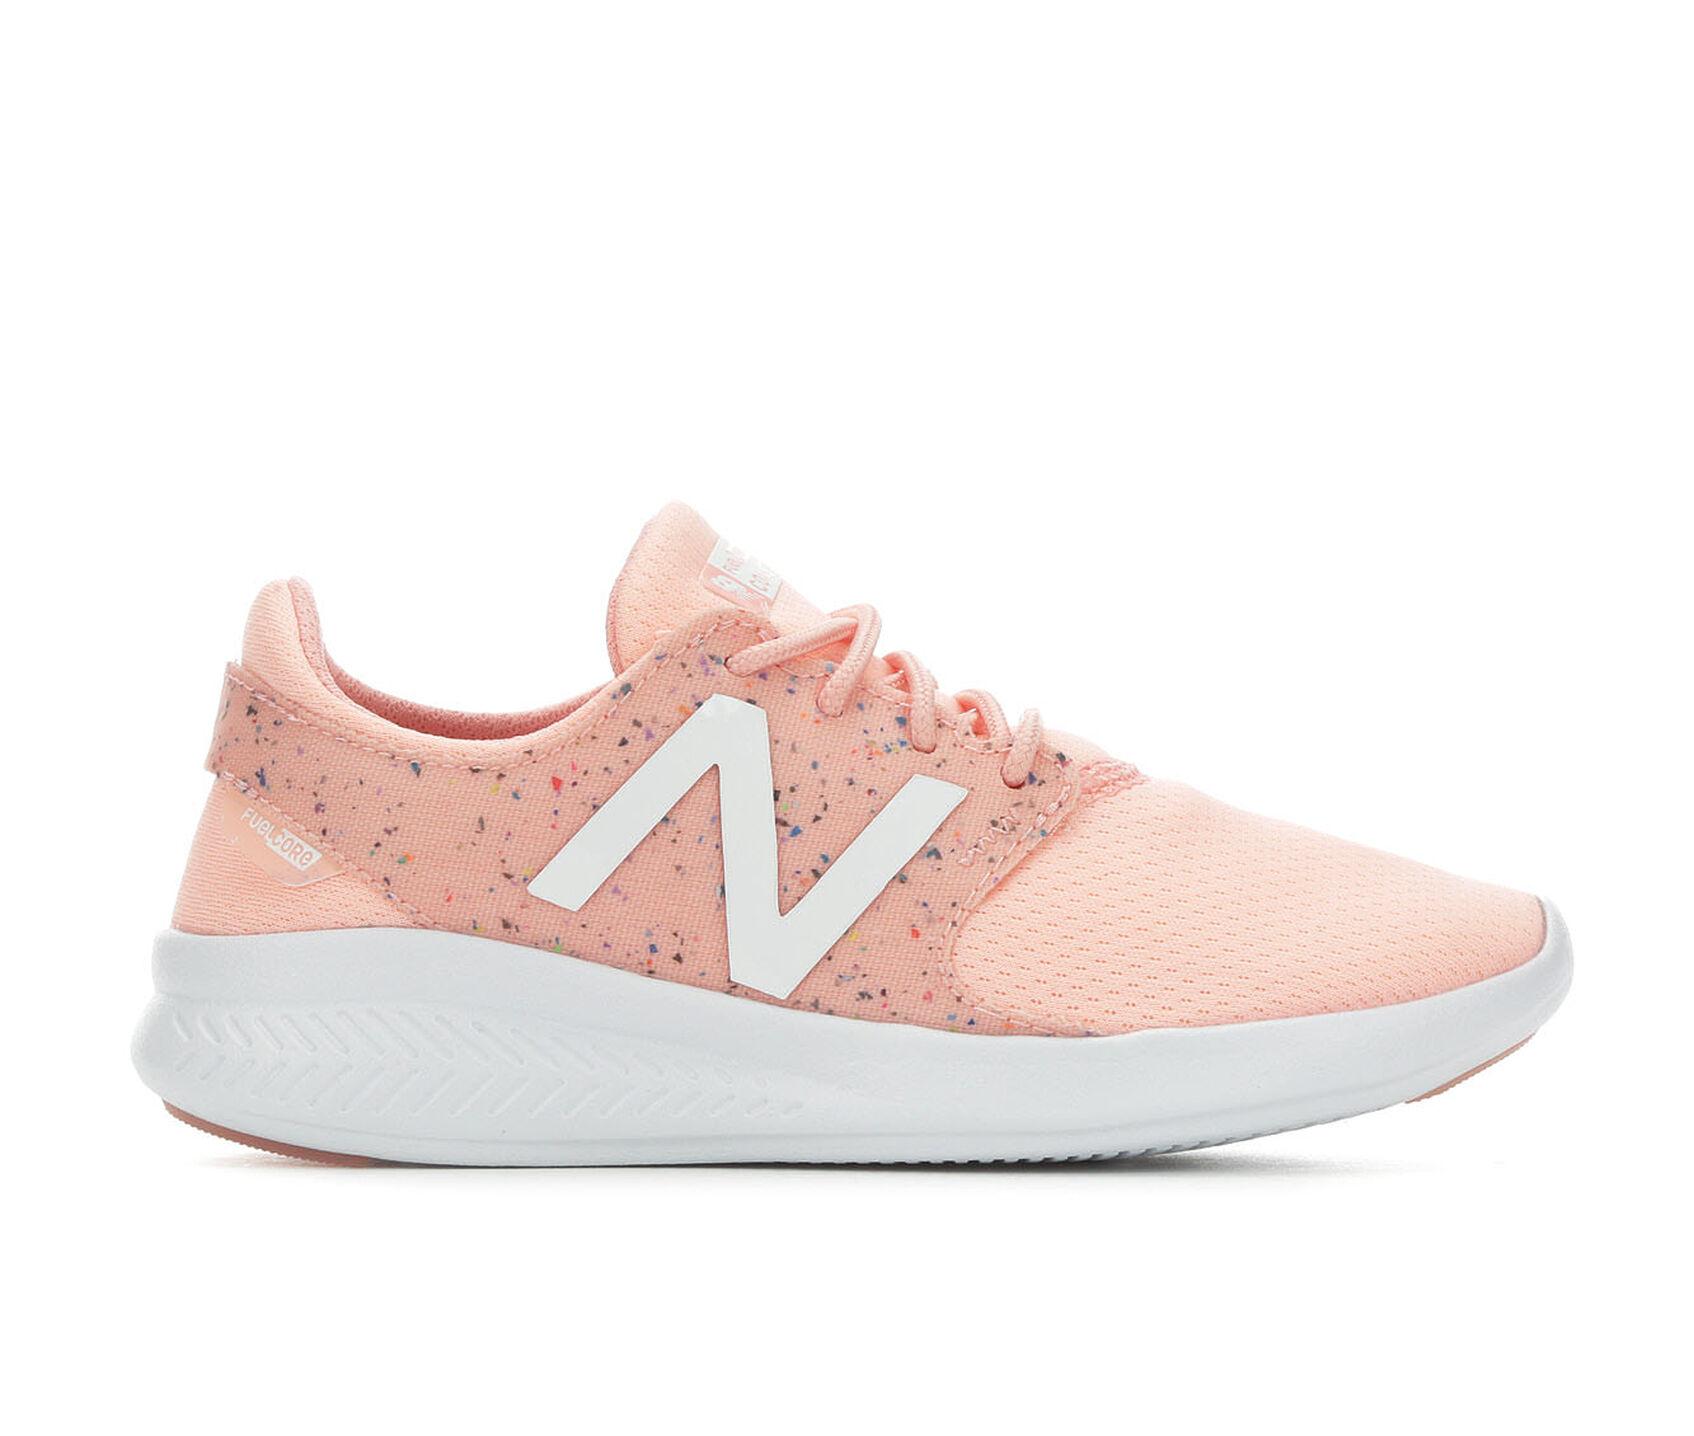 a476a69284a ... New Balance Little Kid  amp  Big Kid KJCSTCHY Running Shoes. Previous